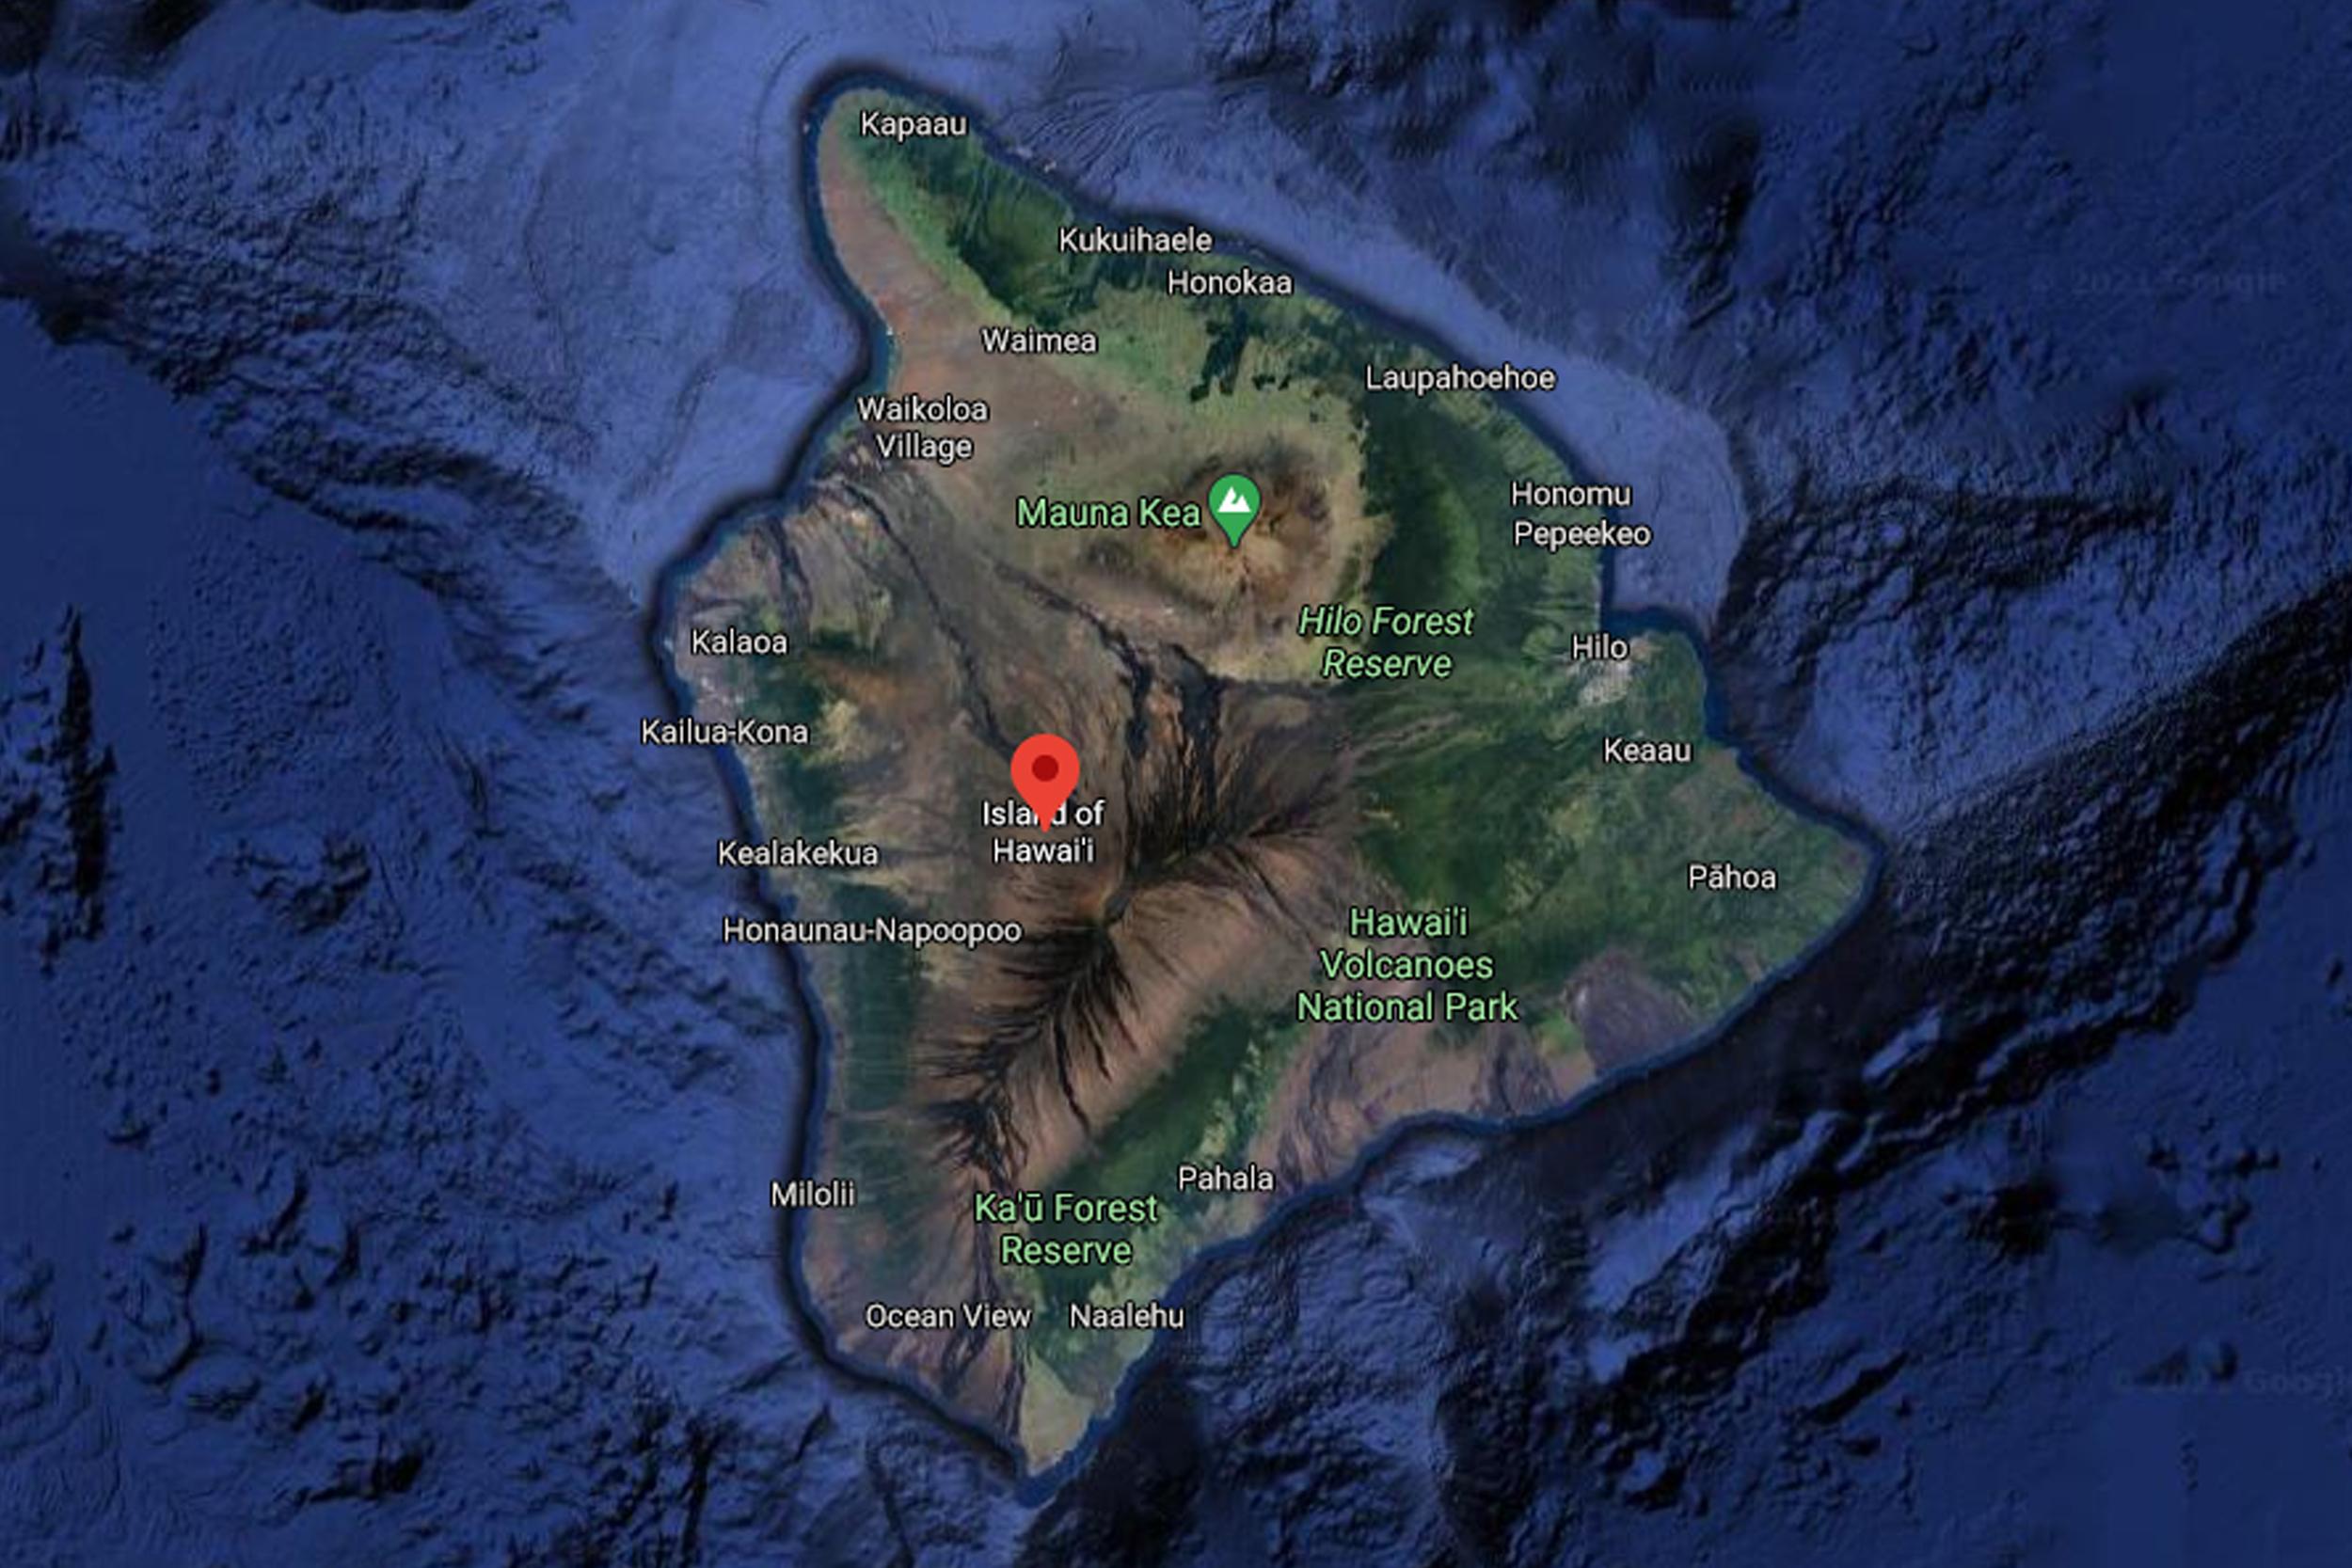 a Google Maps satellite view of Hawaii Island